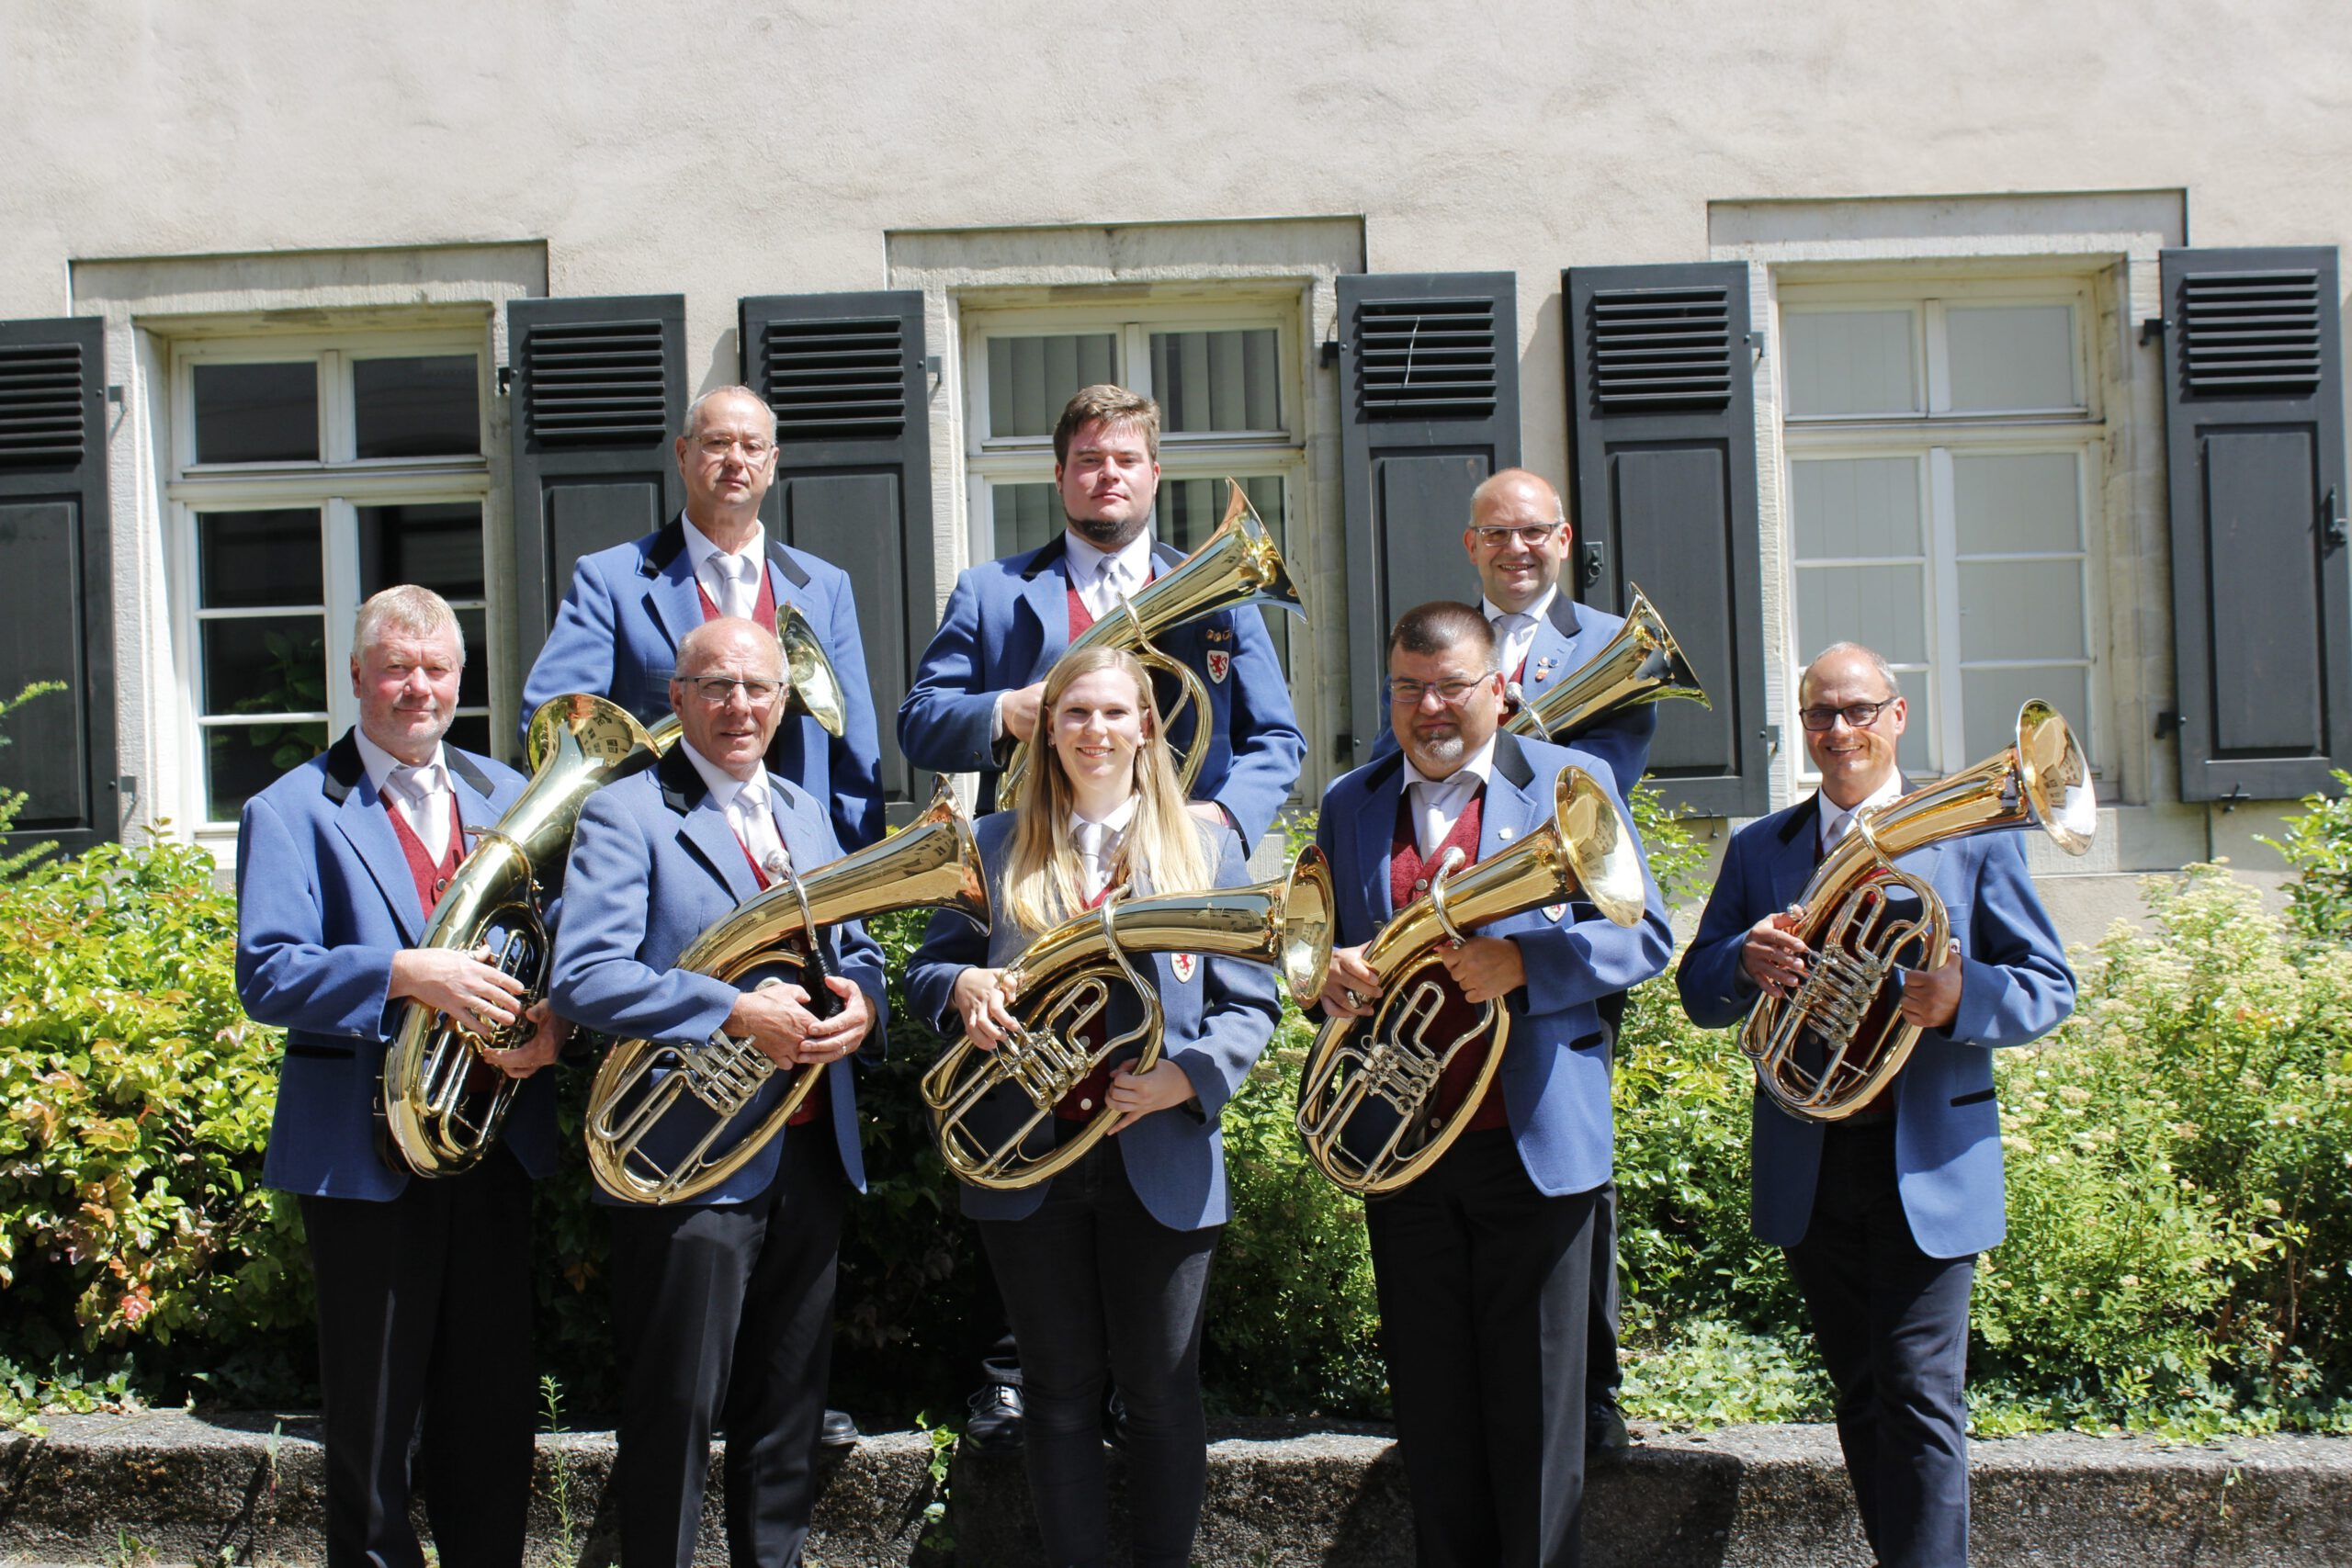 Martin Preisser, Matthias Rauscher, Bernhard Bauer  Bernhard Krieger, Dietmar Ruf, Johanna Schaller, Alexander Nagel, Heinrich Heck